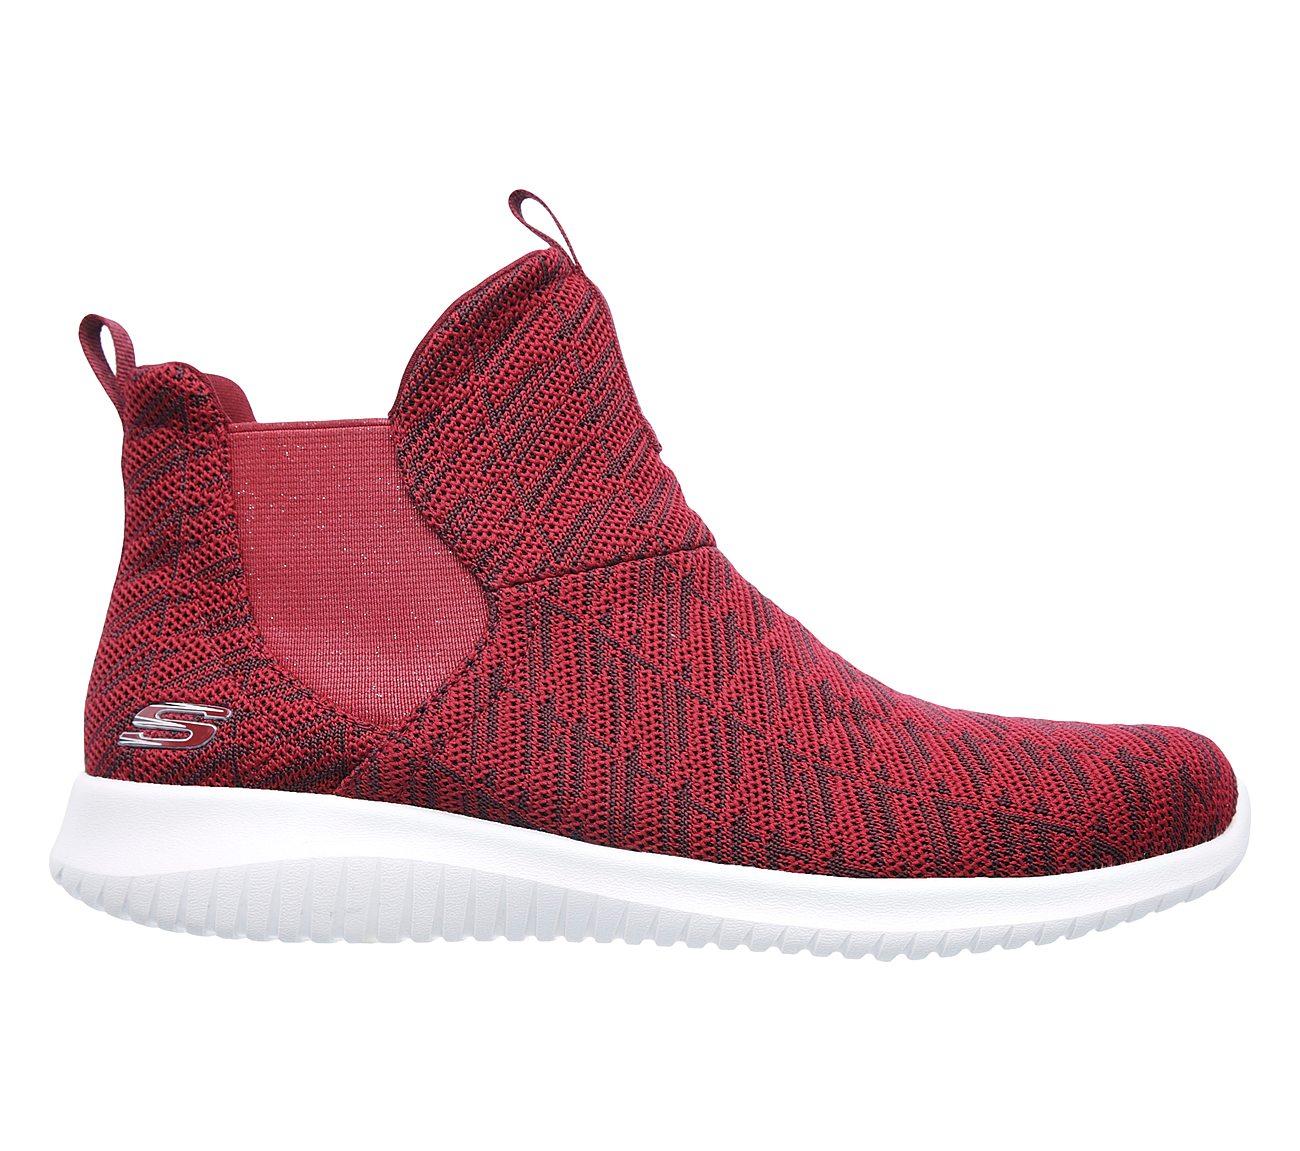 Skechers Ultra Flex High Rise Athletic Women's Shoes Size